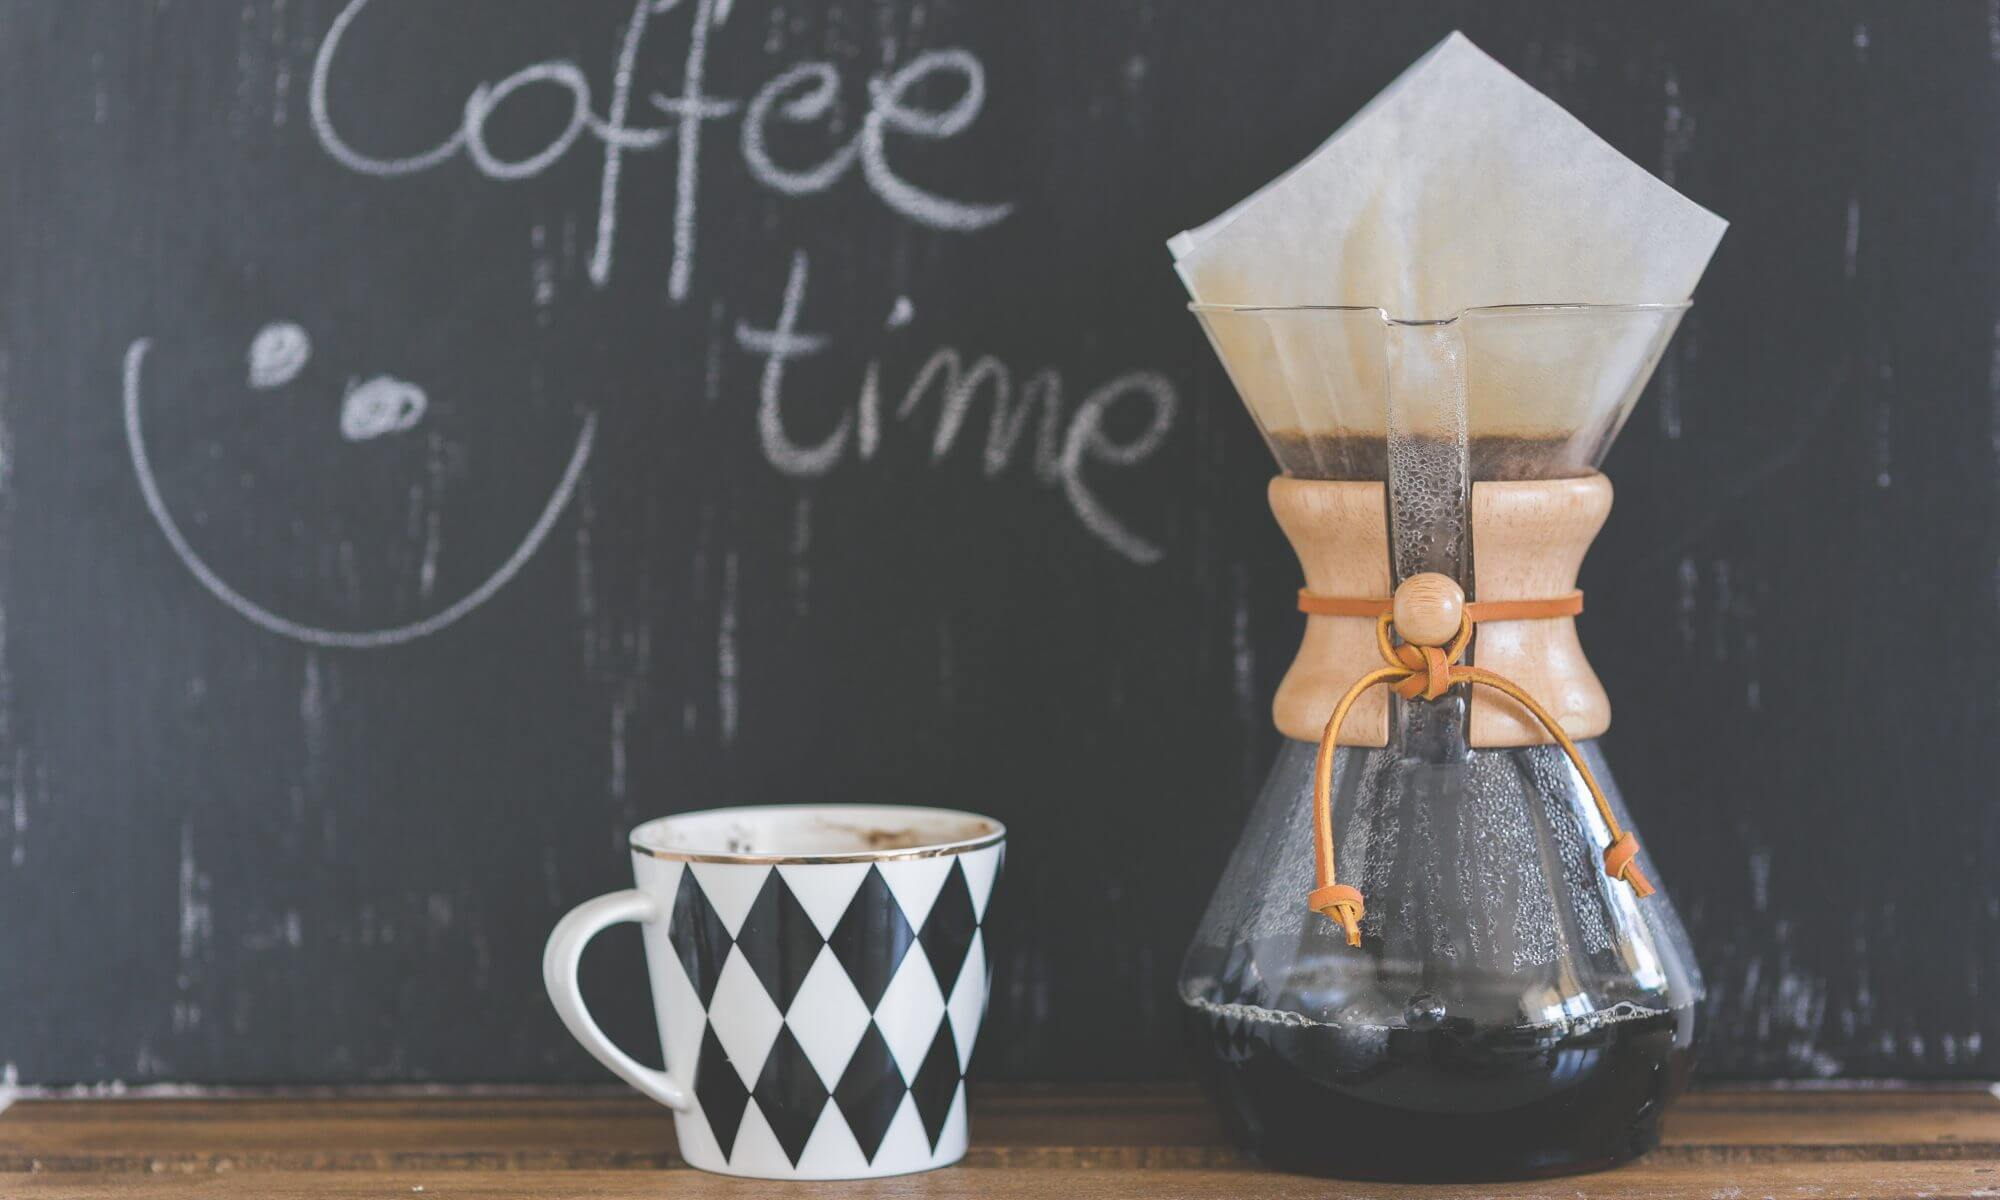 coffee 7 - Как найти интересную работу